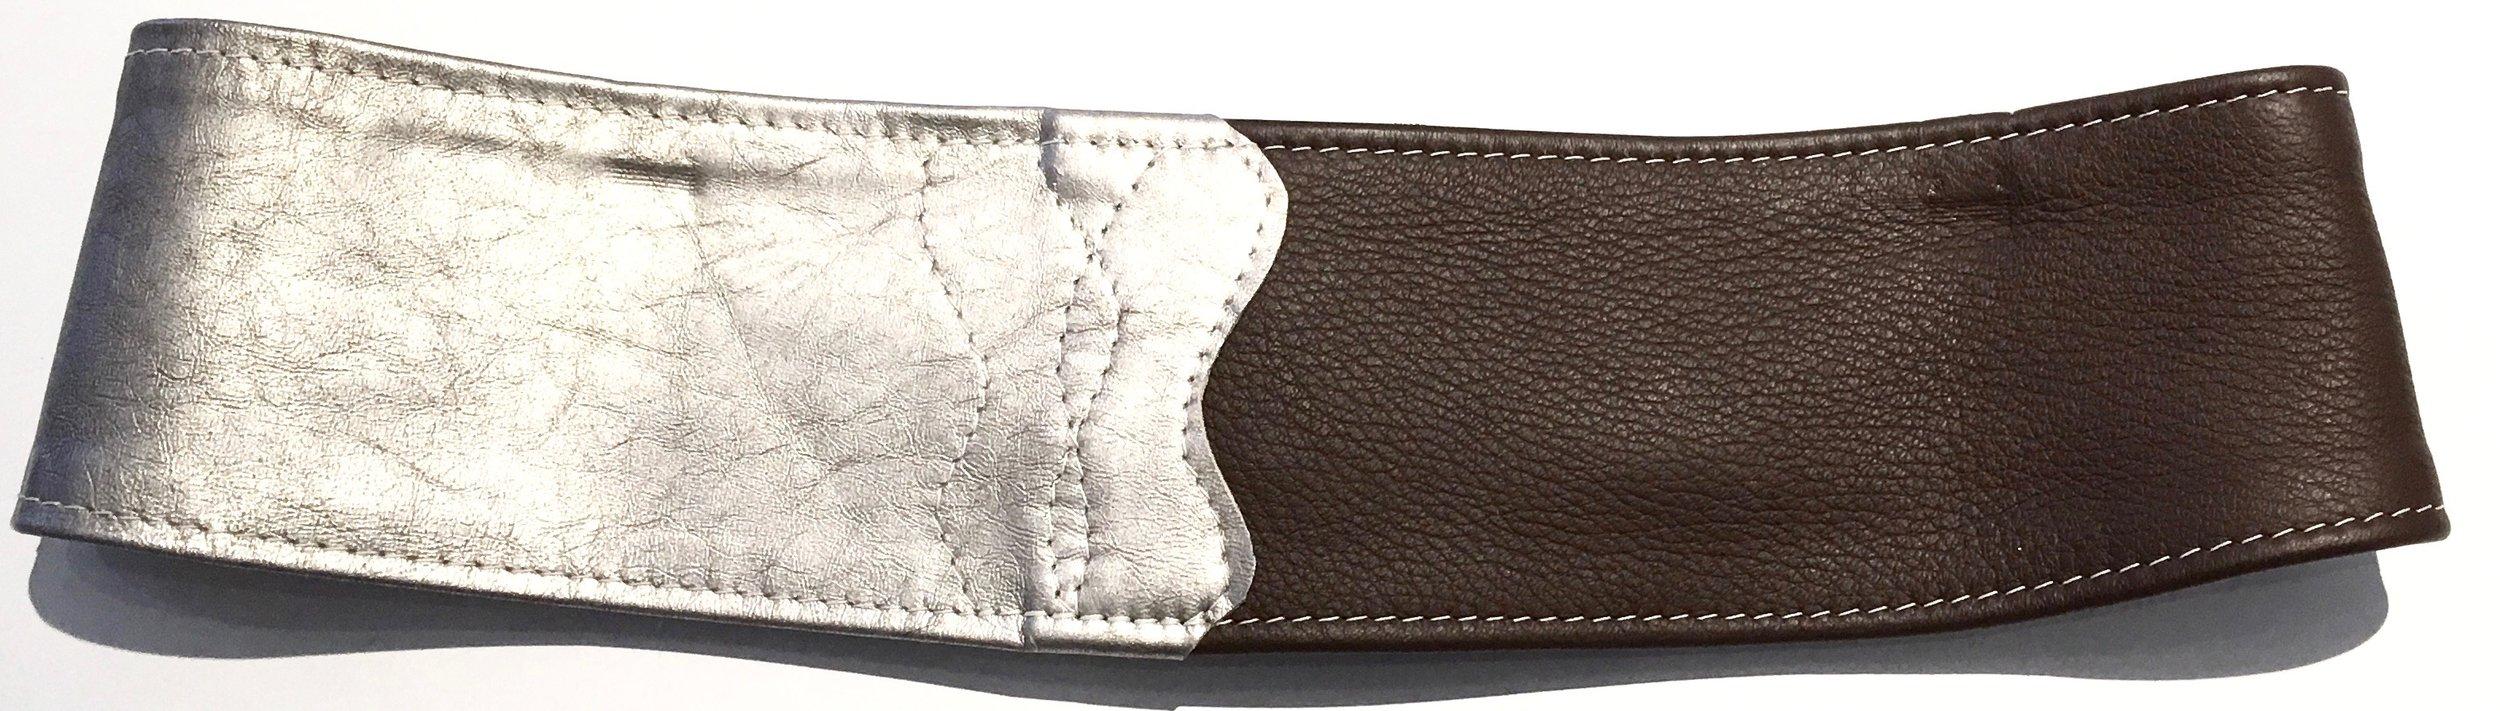 Brown deerskin and silver metallic lambkin HipWear.  Polished nickel D ring and adjustable velcro closure. Back view..jpg